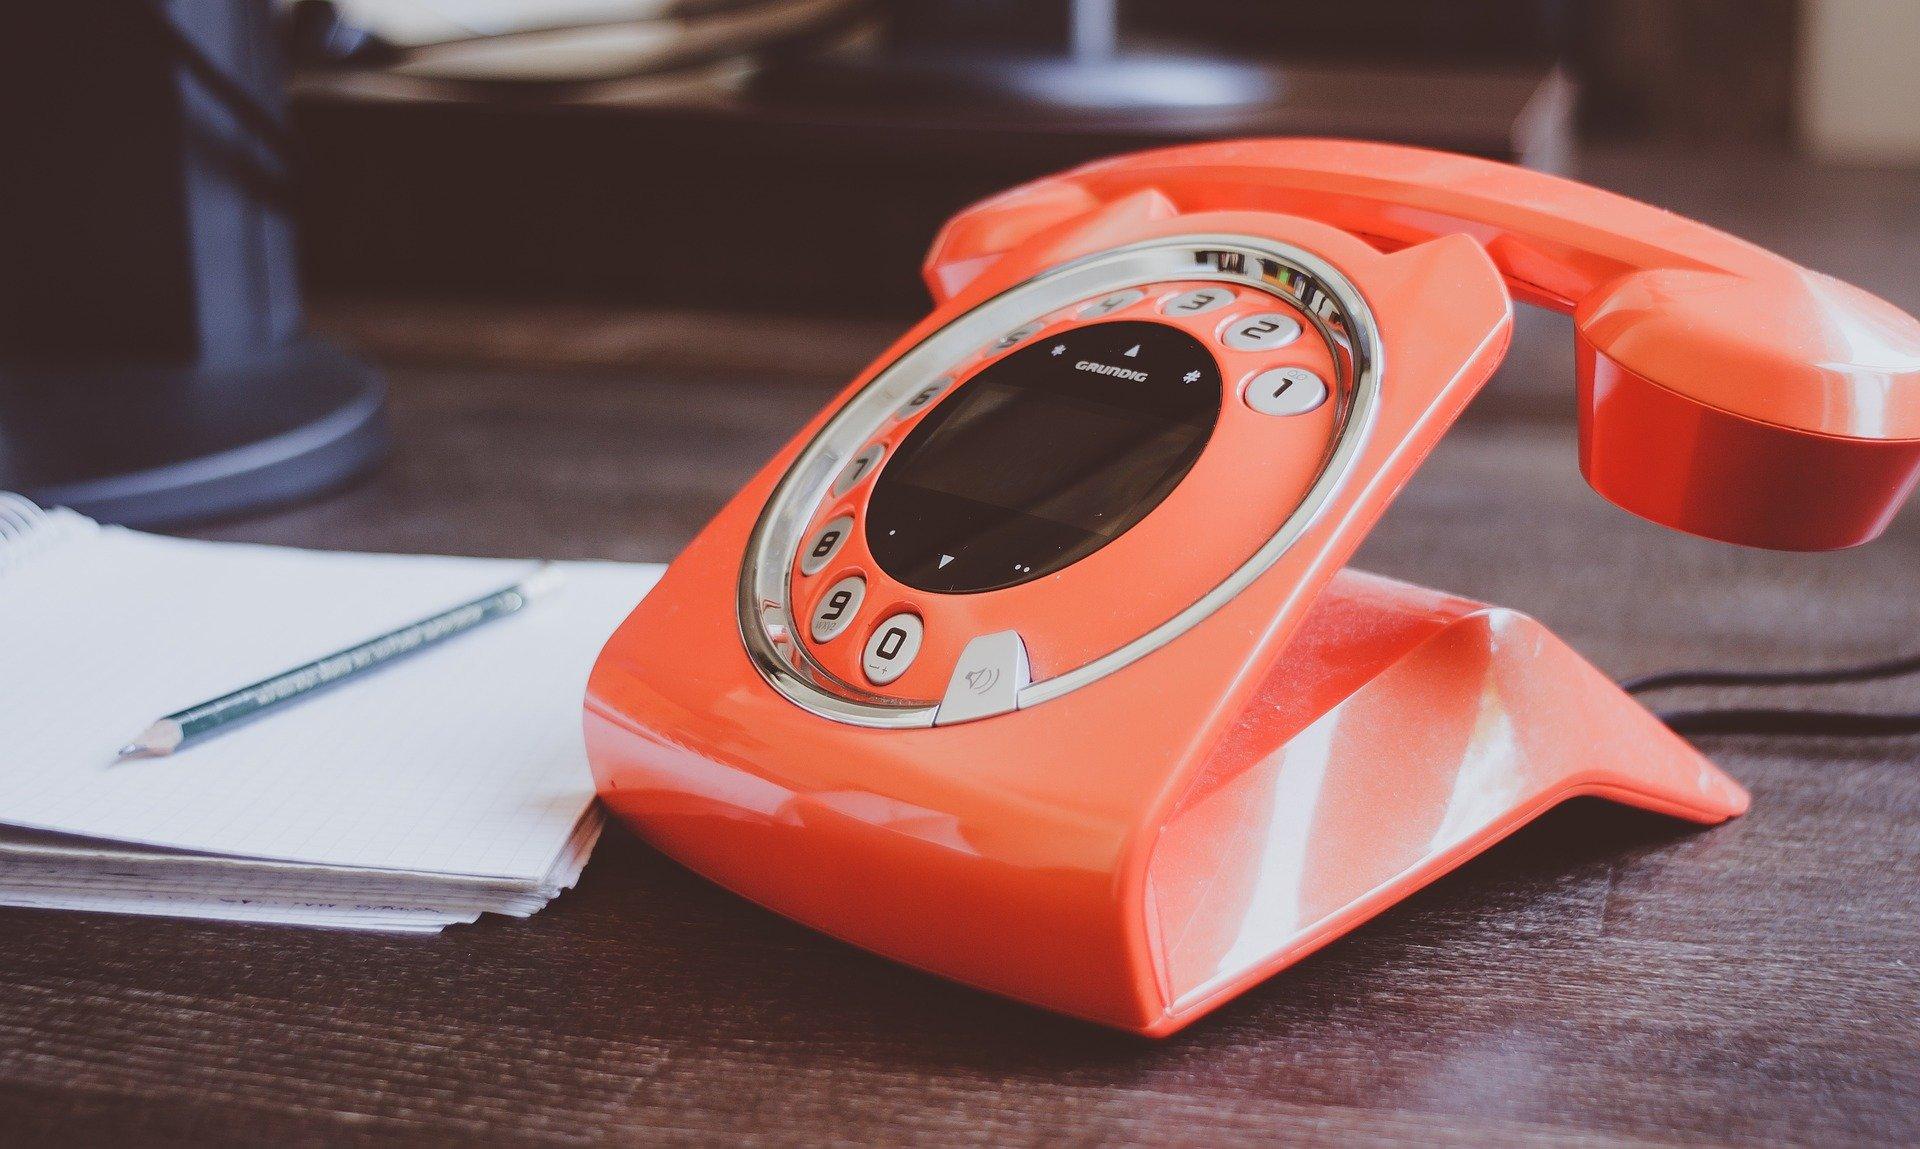 phone-1684638_1920